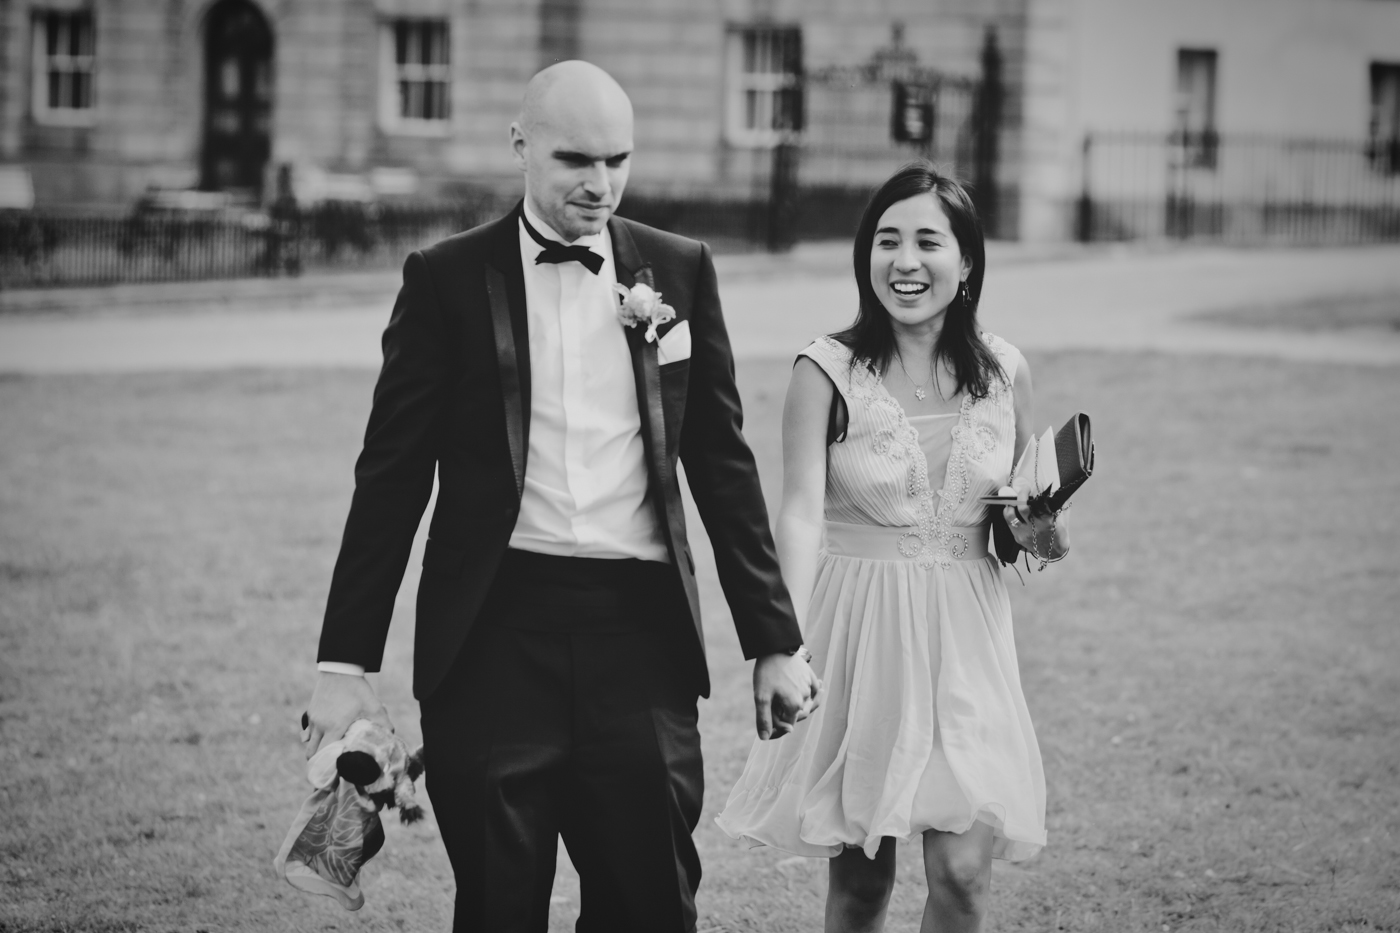 137 - Abi and Chris at Kedleston Hall - Wedding Photography by Mark Pugh www.markpugh.com - 0460.JPG